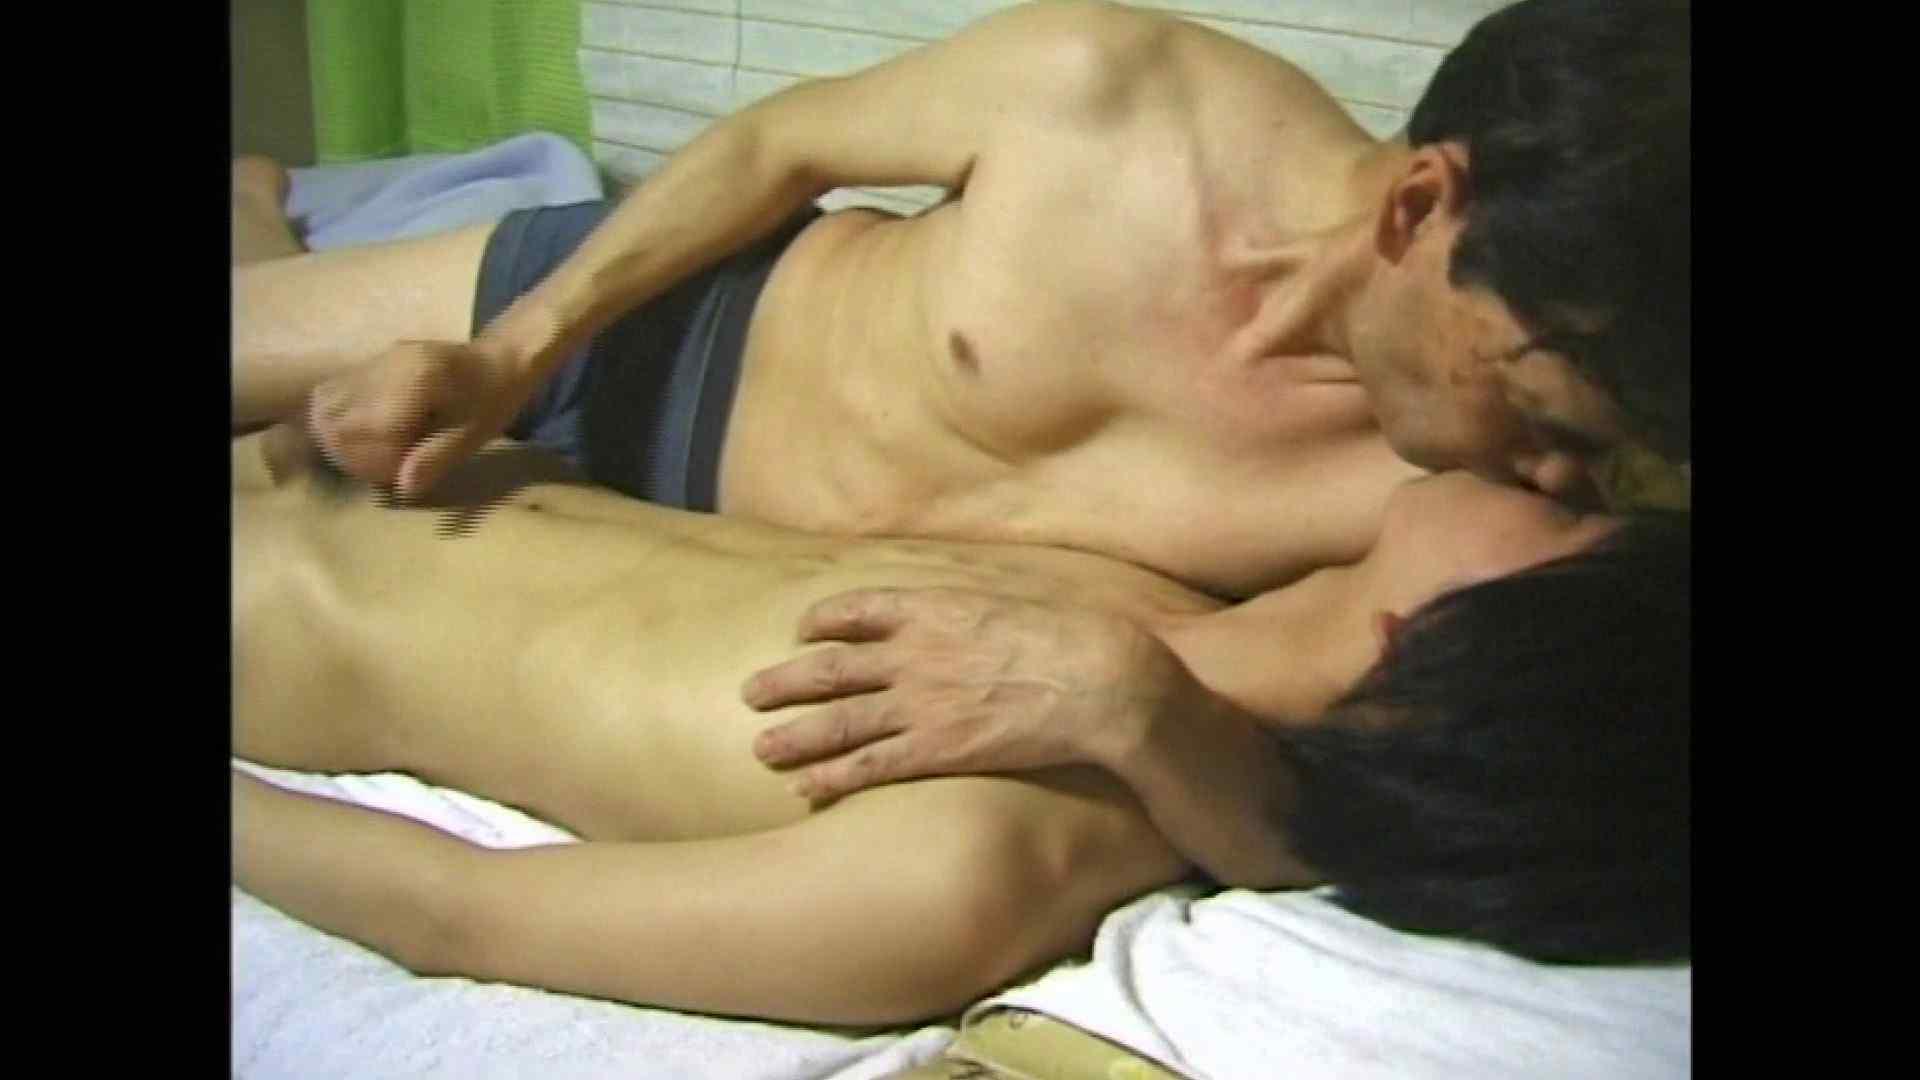 GAYBOY宏のオカズ倉庫Vol.1-2 ゲイのペニス ゲイ精子画像 60枚 27